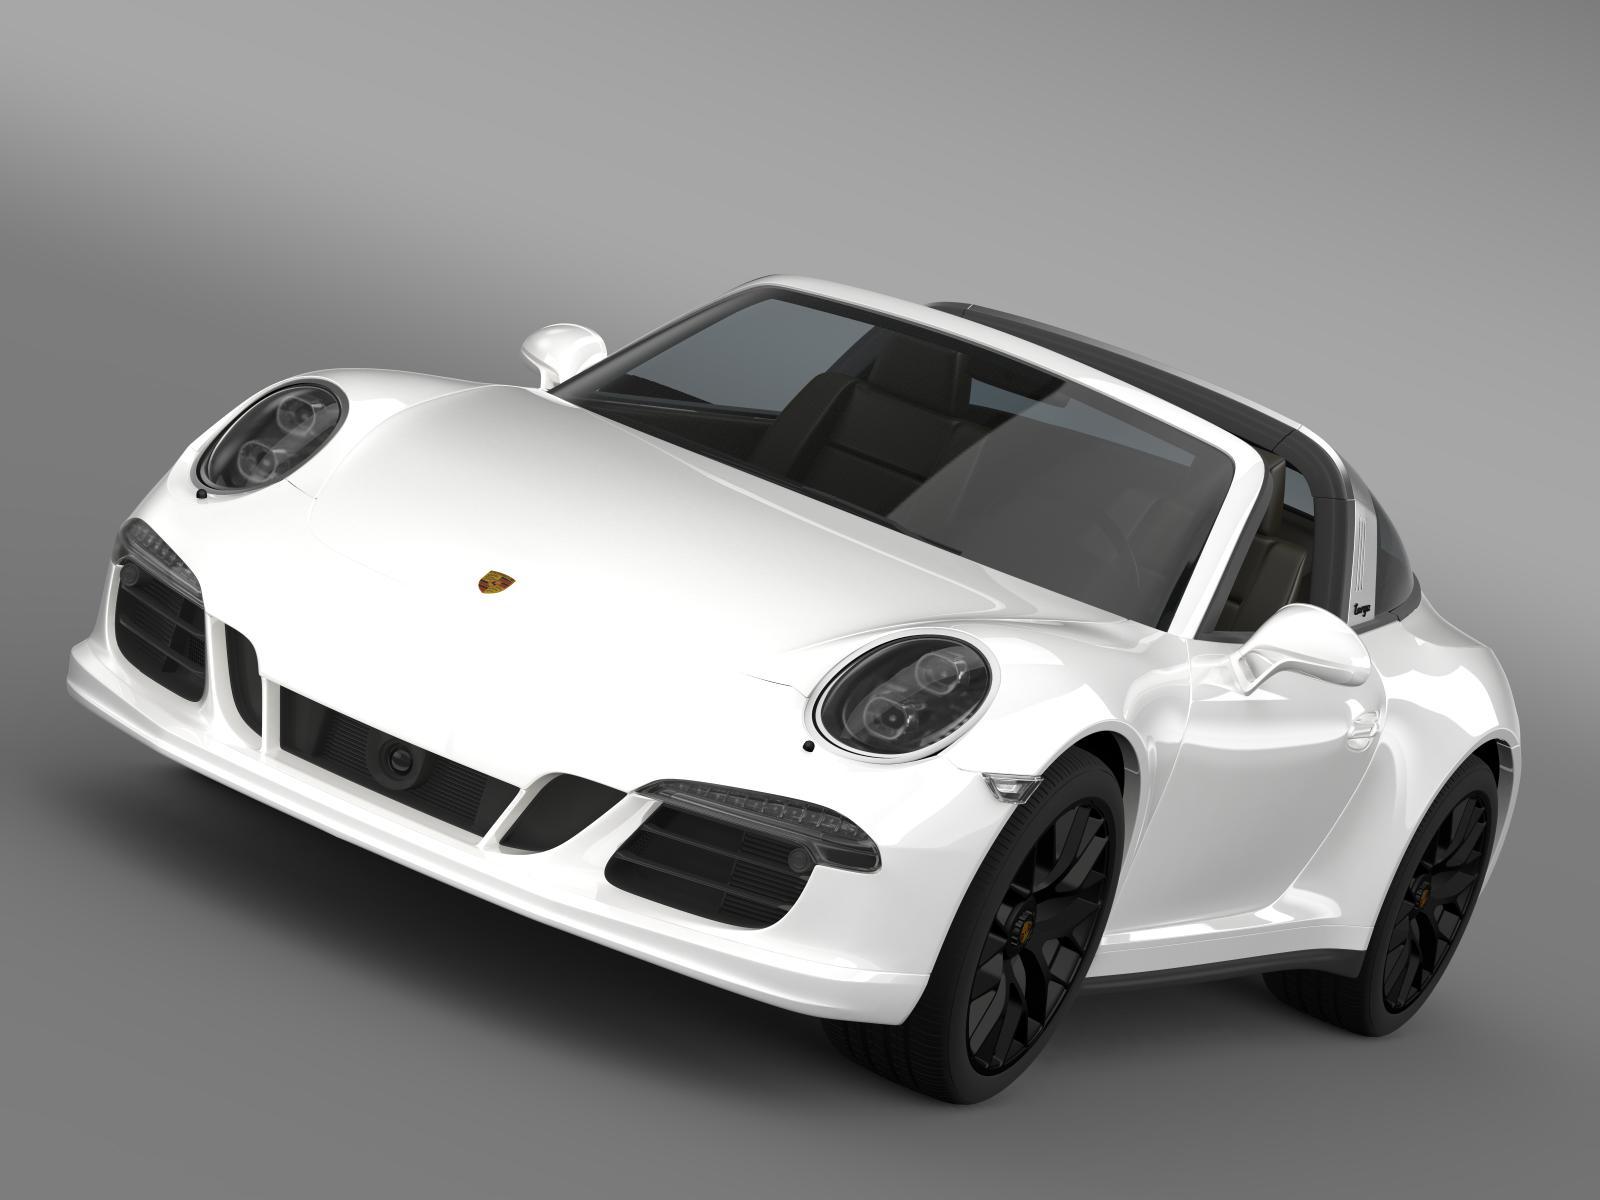 Porsche 911 Targa 4 Gts 991 2015 3d Model Buy Porsche